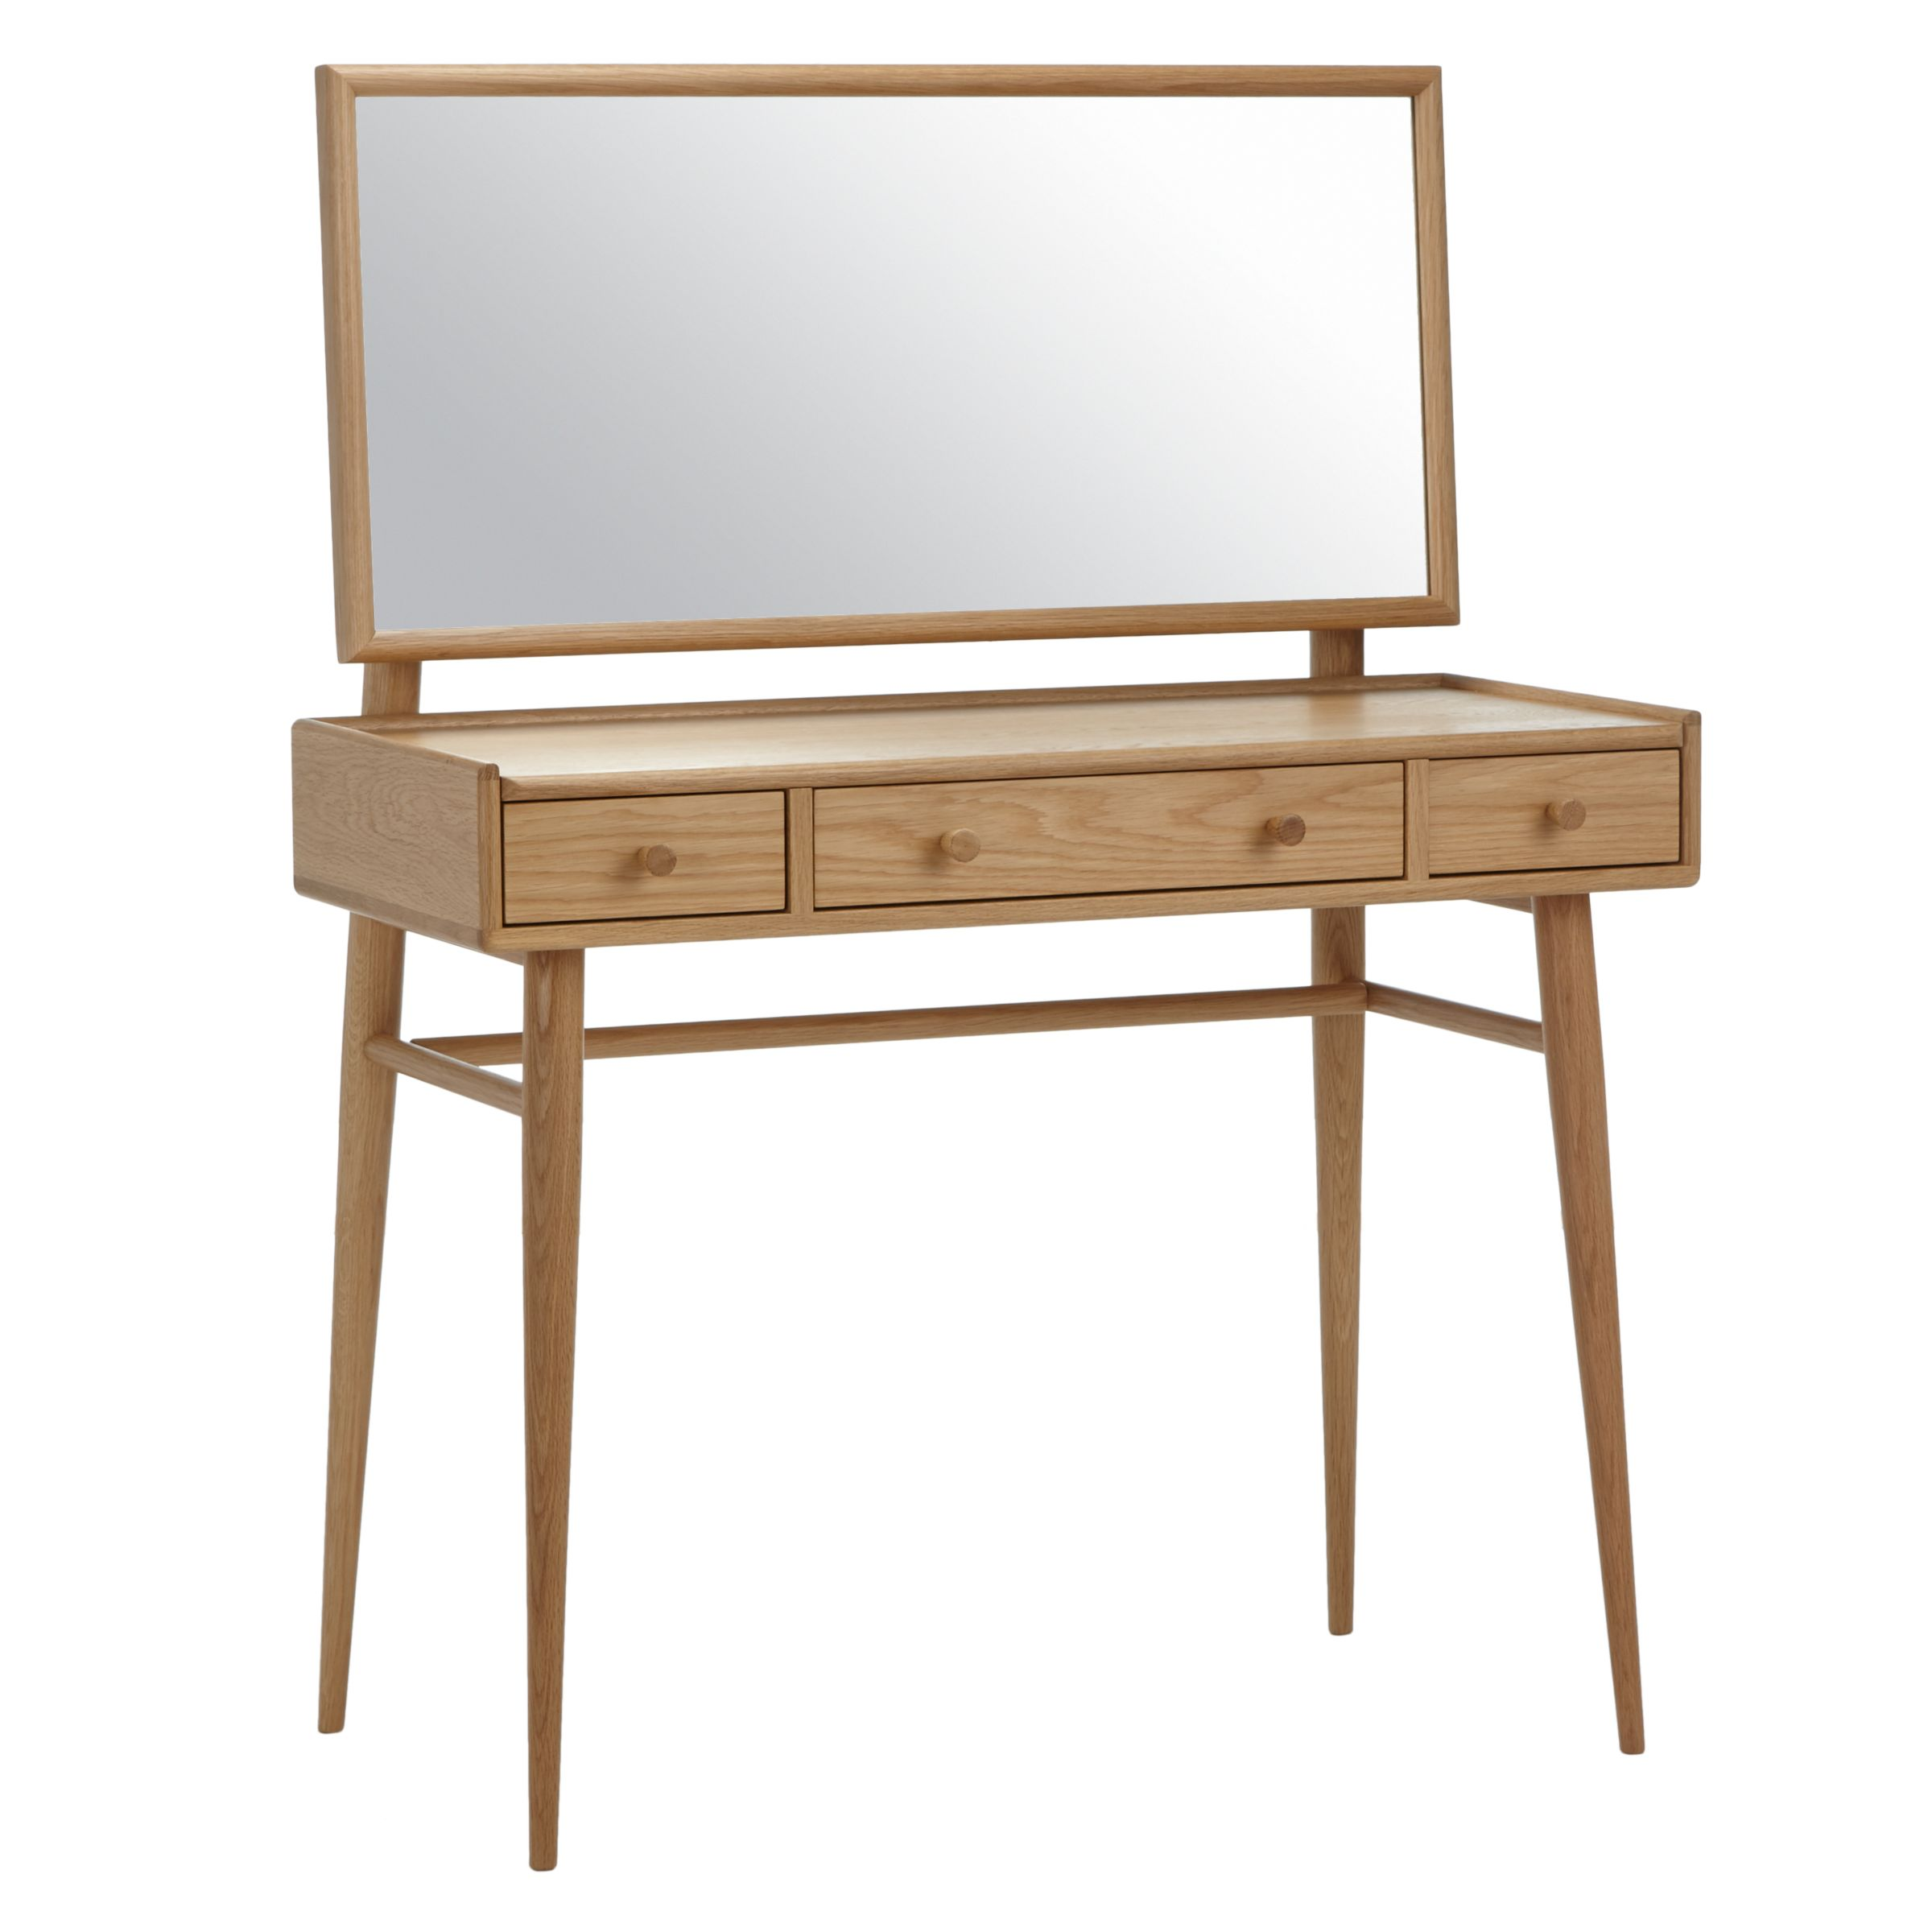 Buy ercol for john lewis shalstone dressing table john lewis for Table dressing